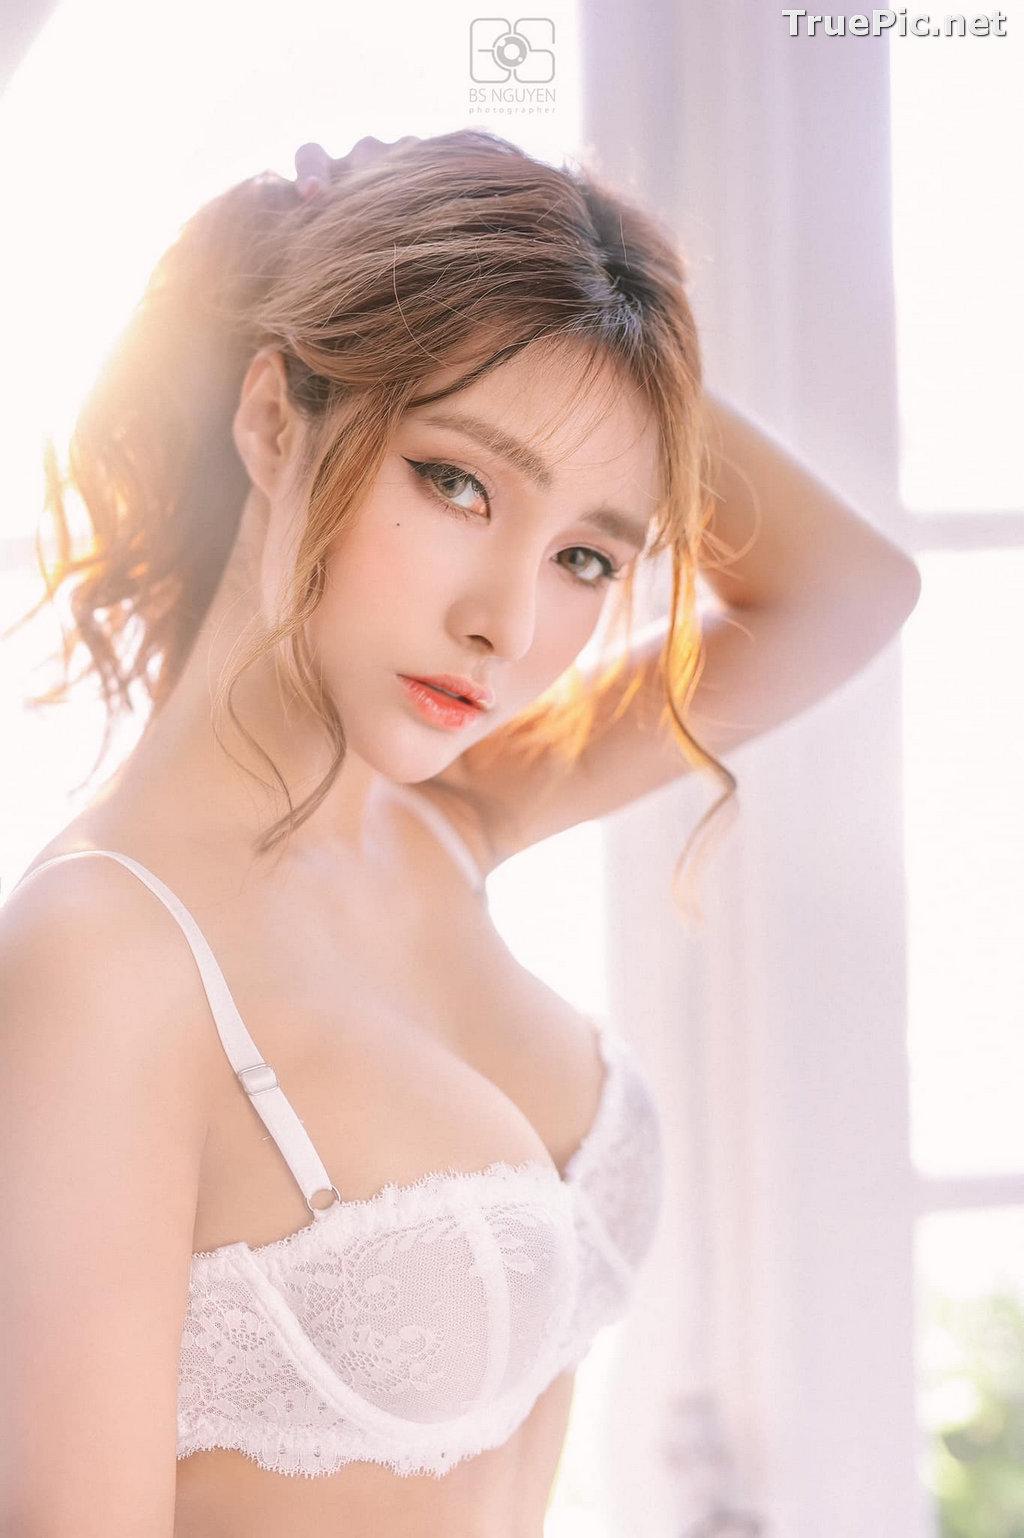 Image Vietnamese Model - Nguyen Thi Phi Yen - Beautiful Sexy White Lingerie - TruePic.net - Picture-20